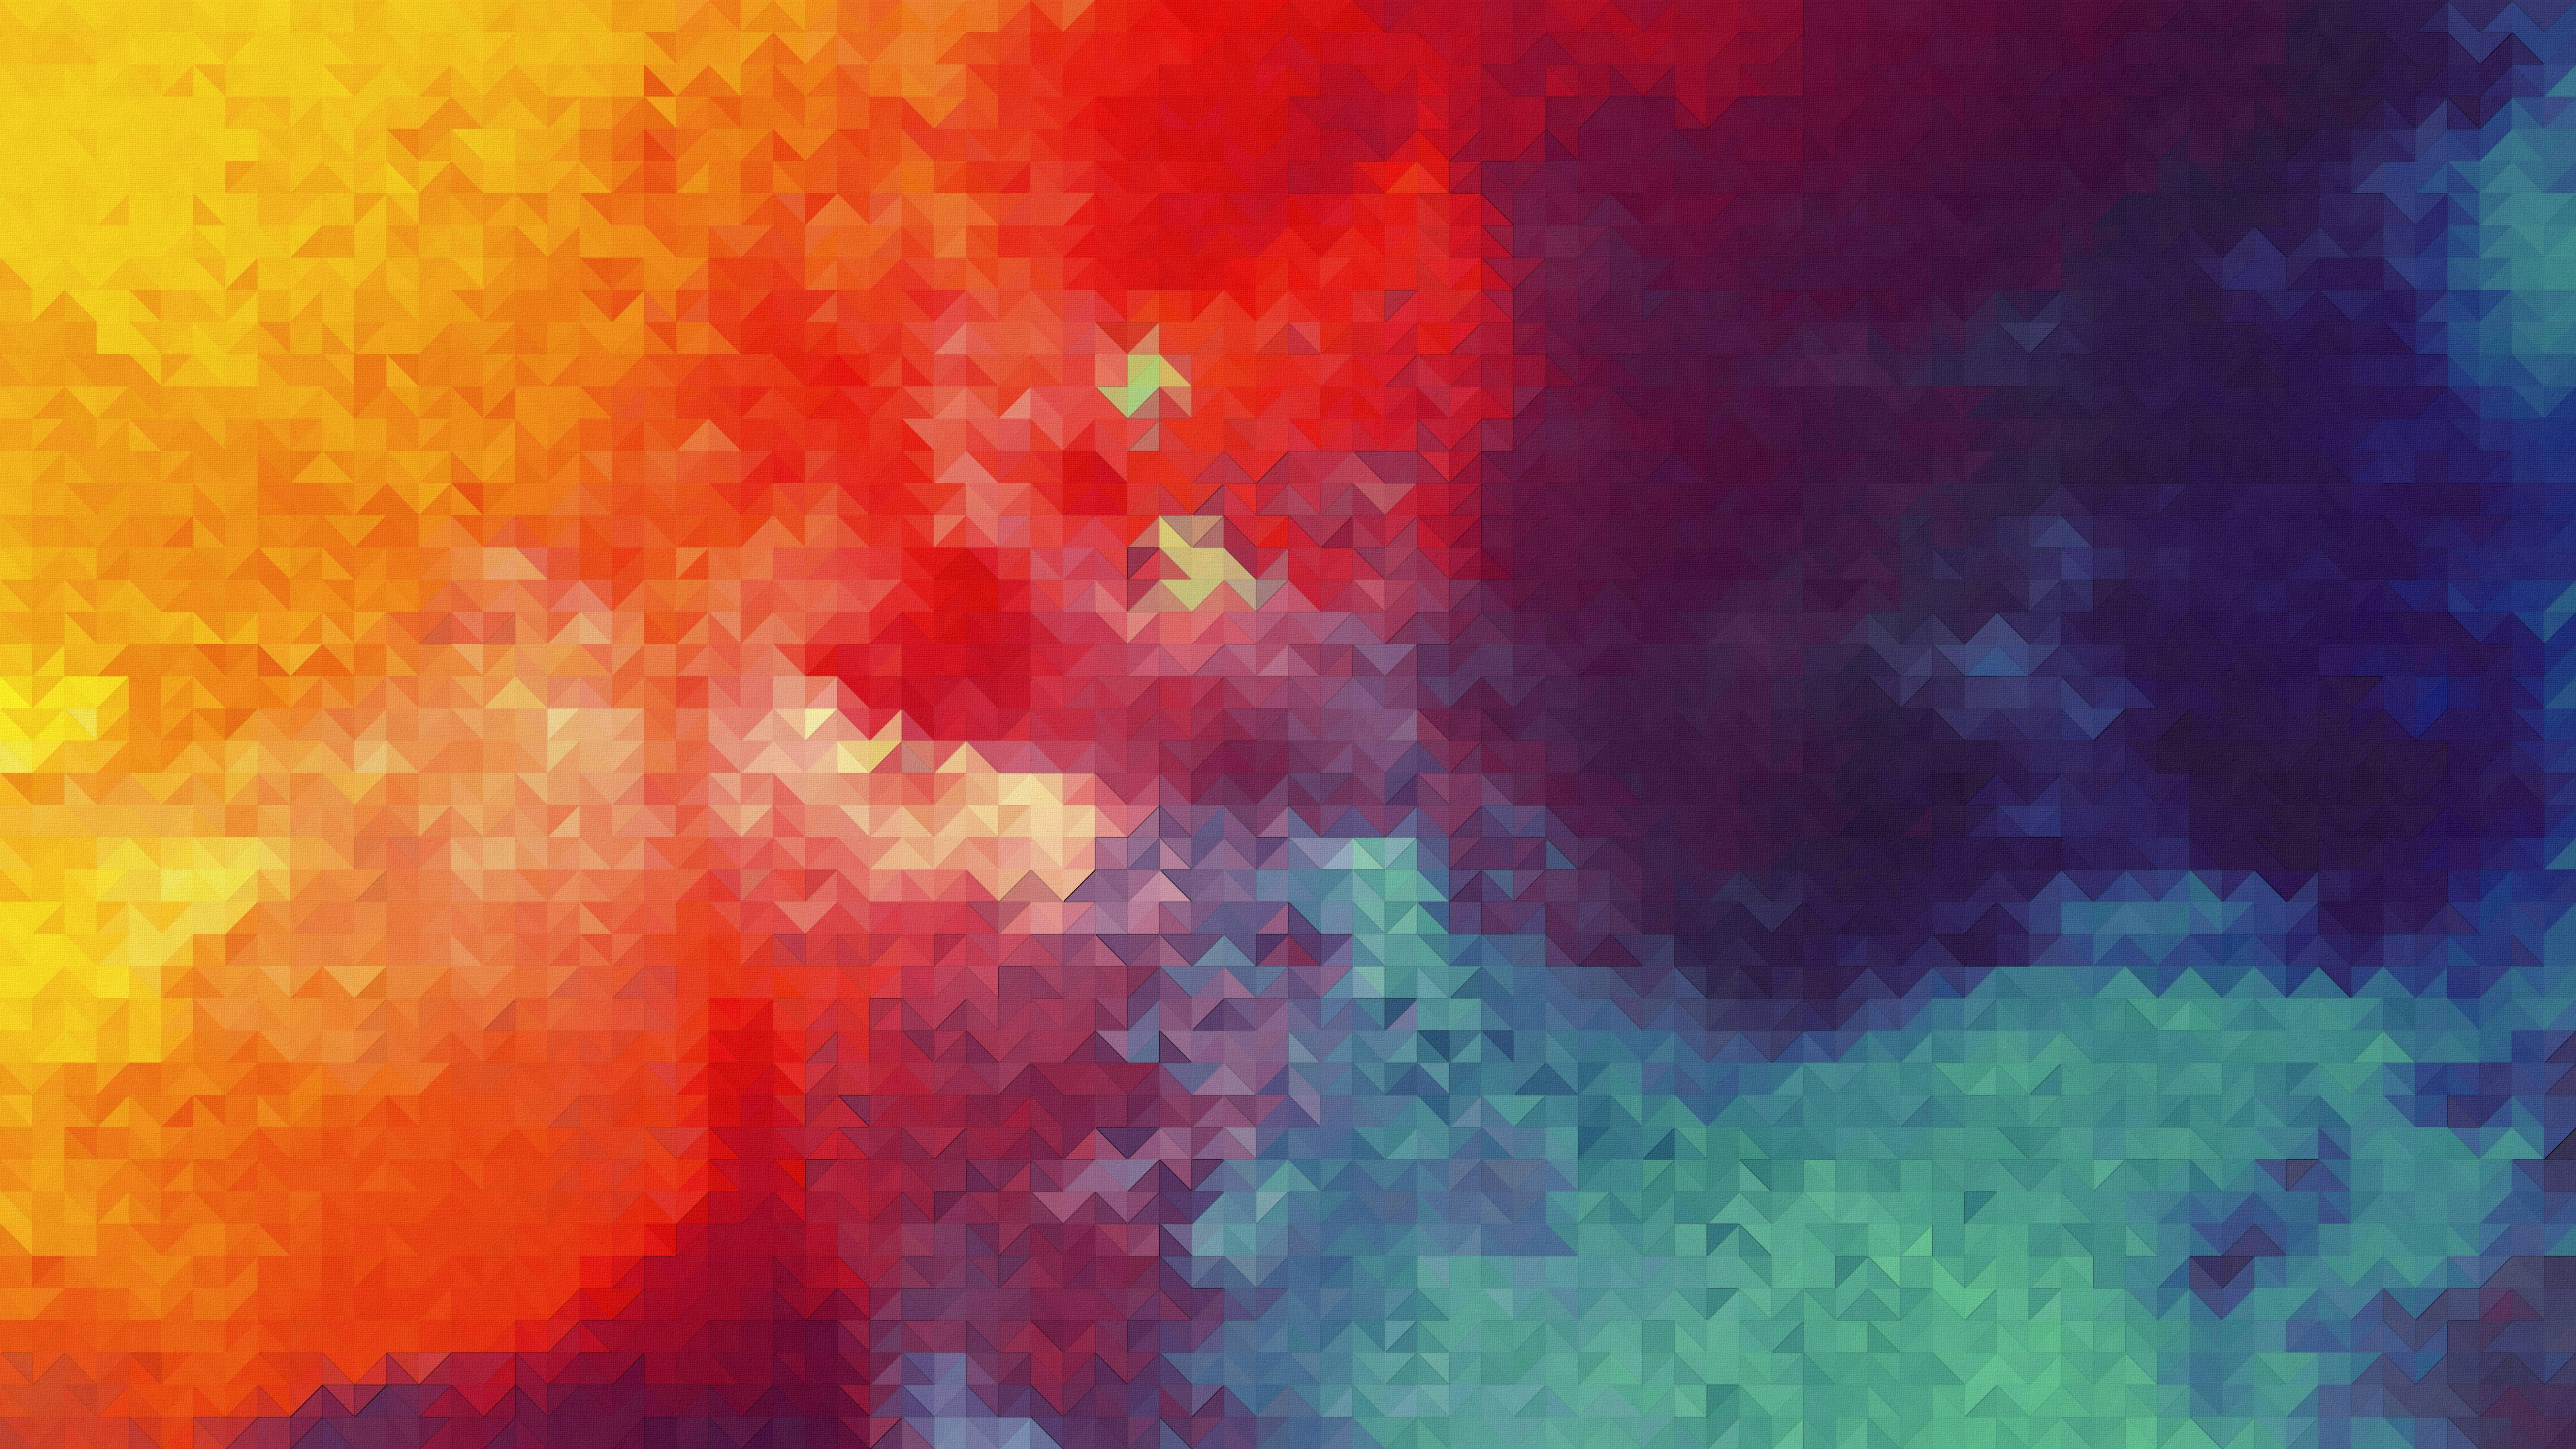 42 stunning abstract 4k wallpapers to beautify desktop webrfree - Hd ink wallpaper ...